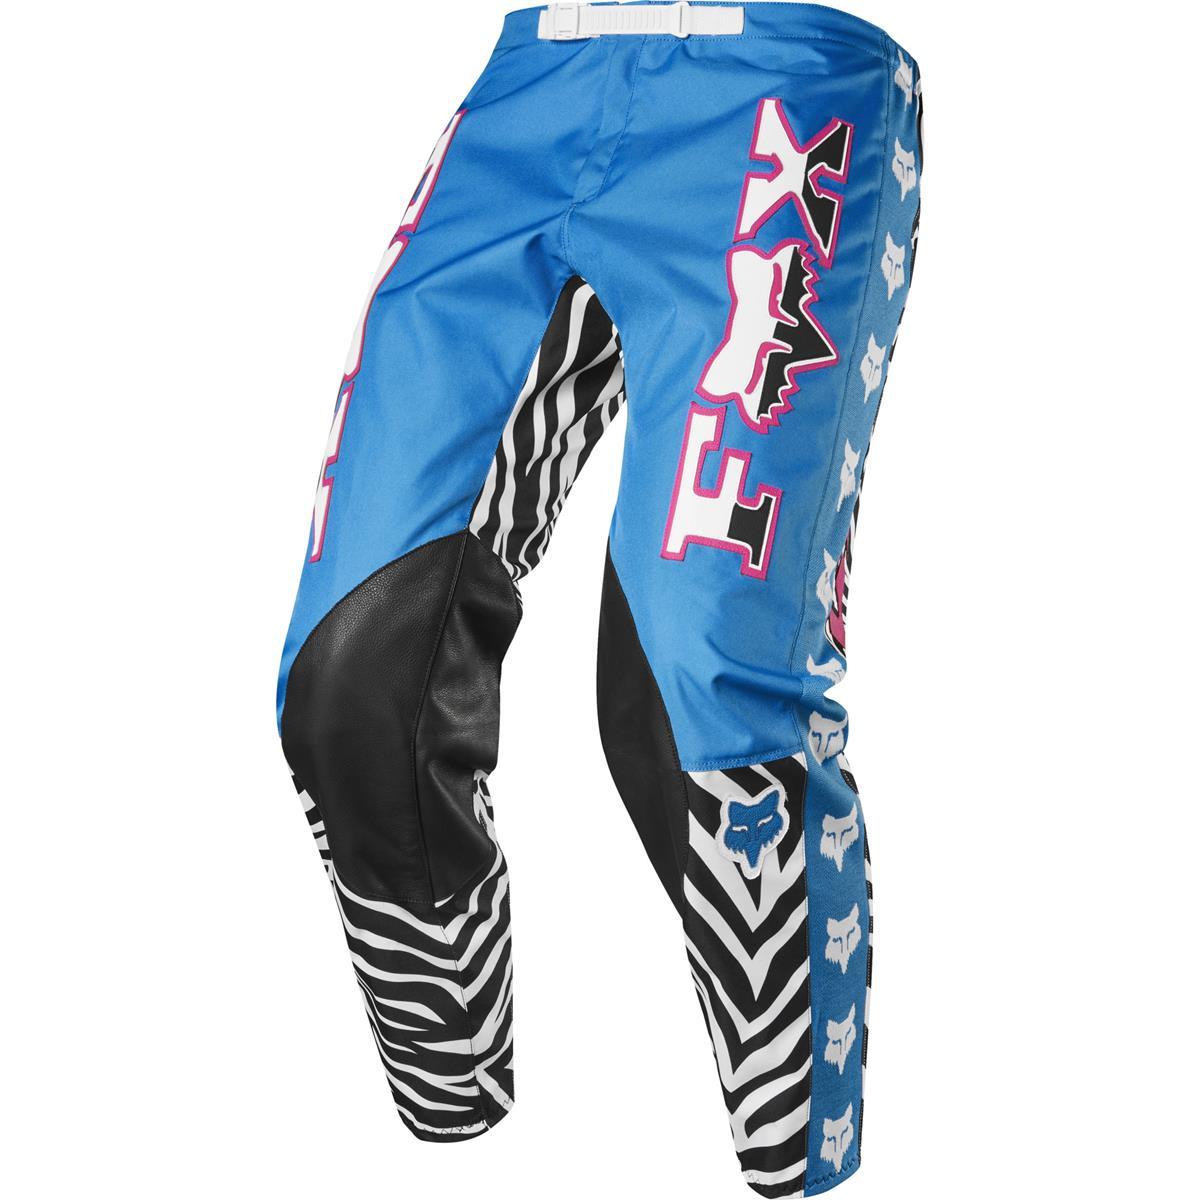 Fox MX Hose Retro Zebra Limited Edition - Cyan